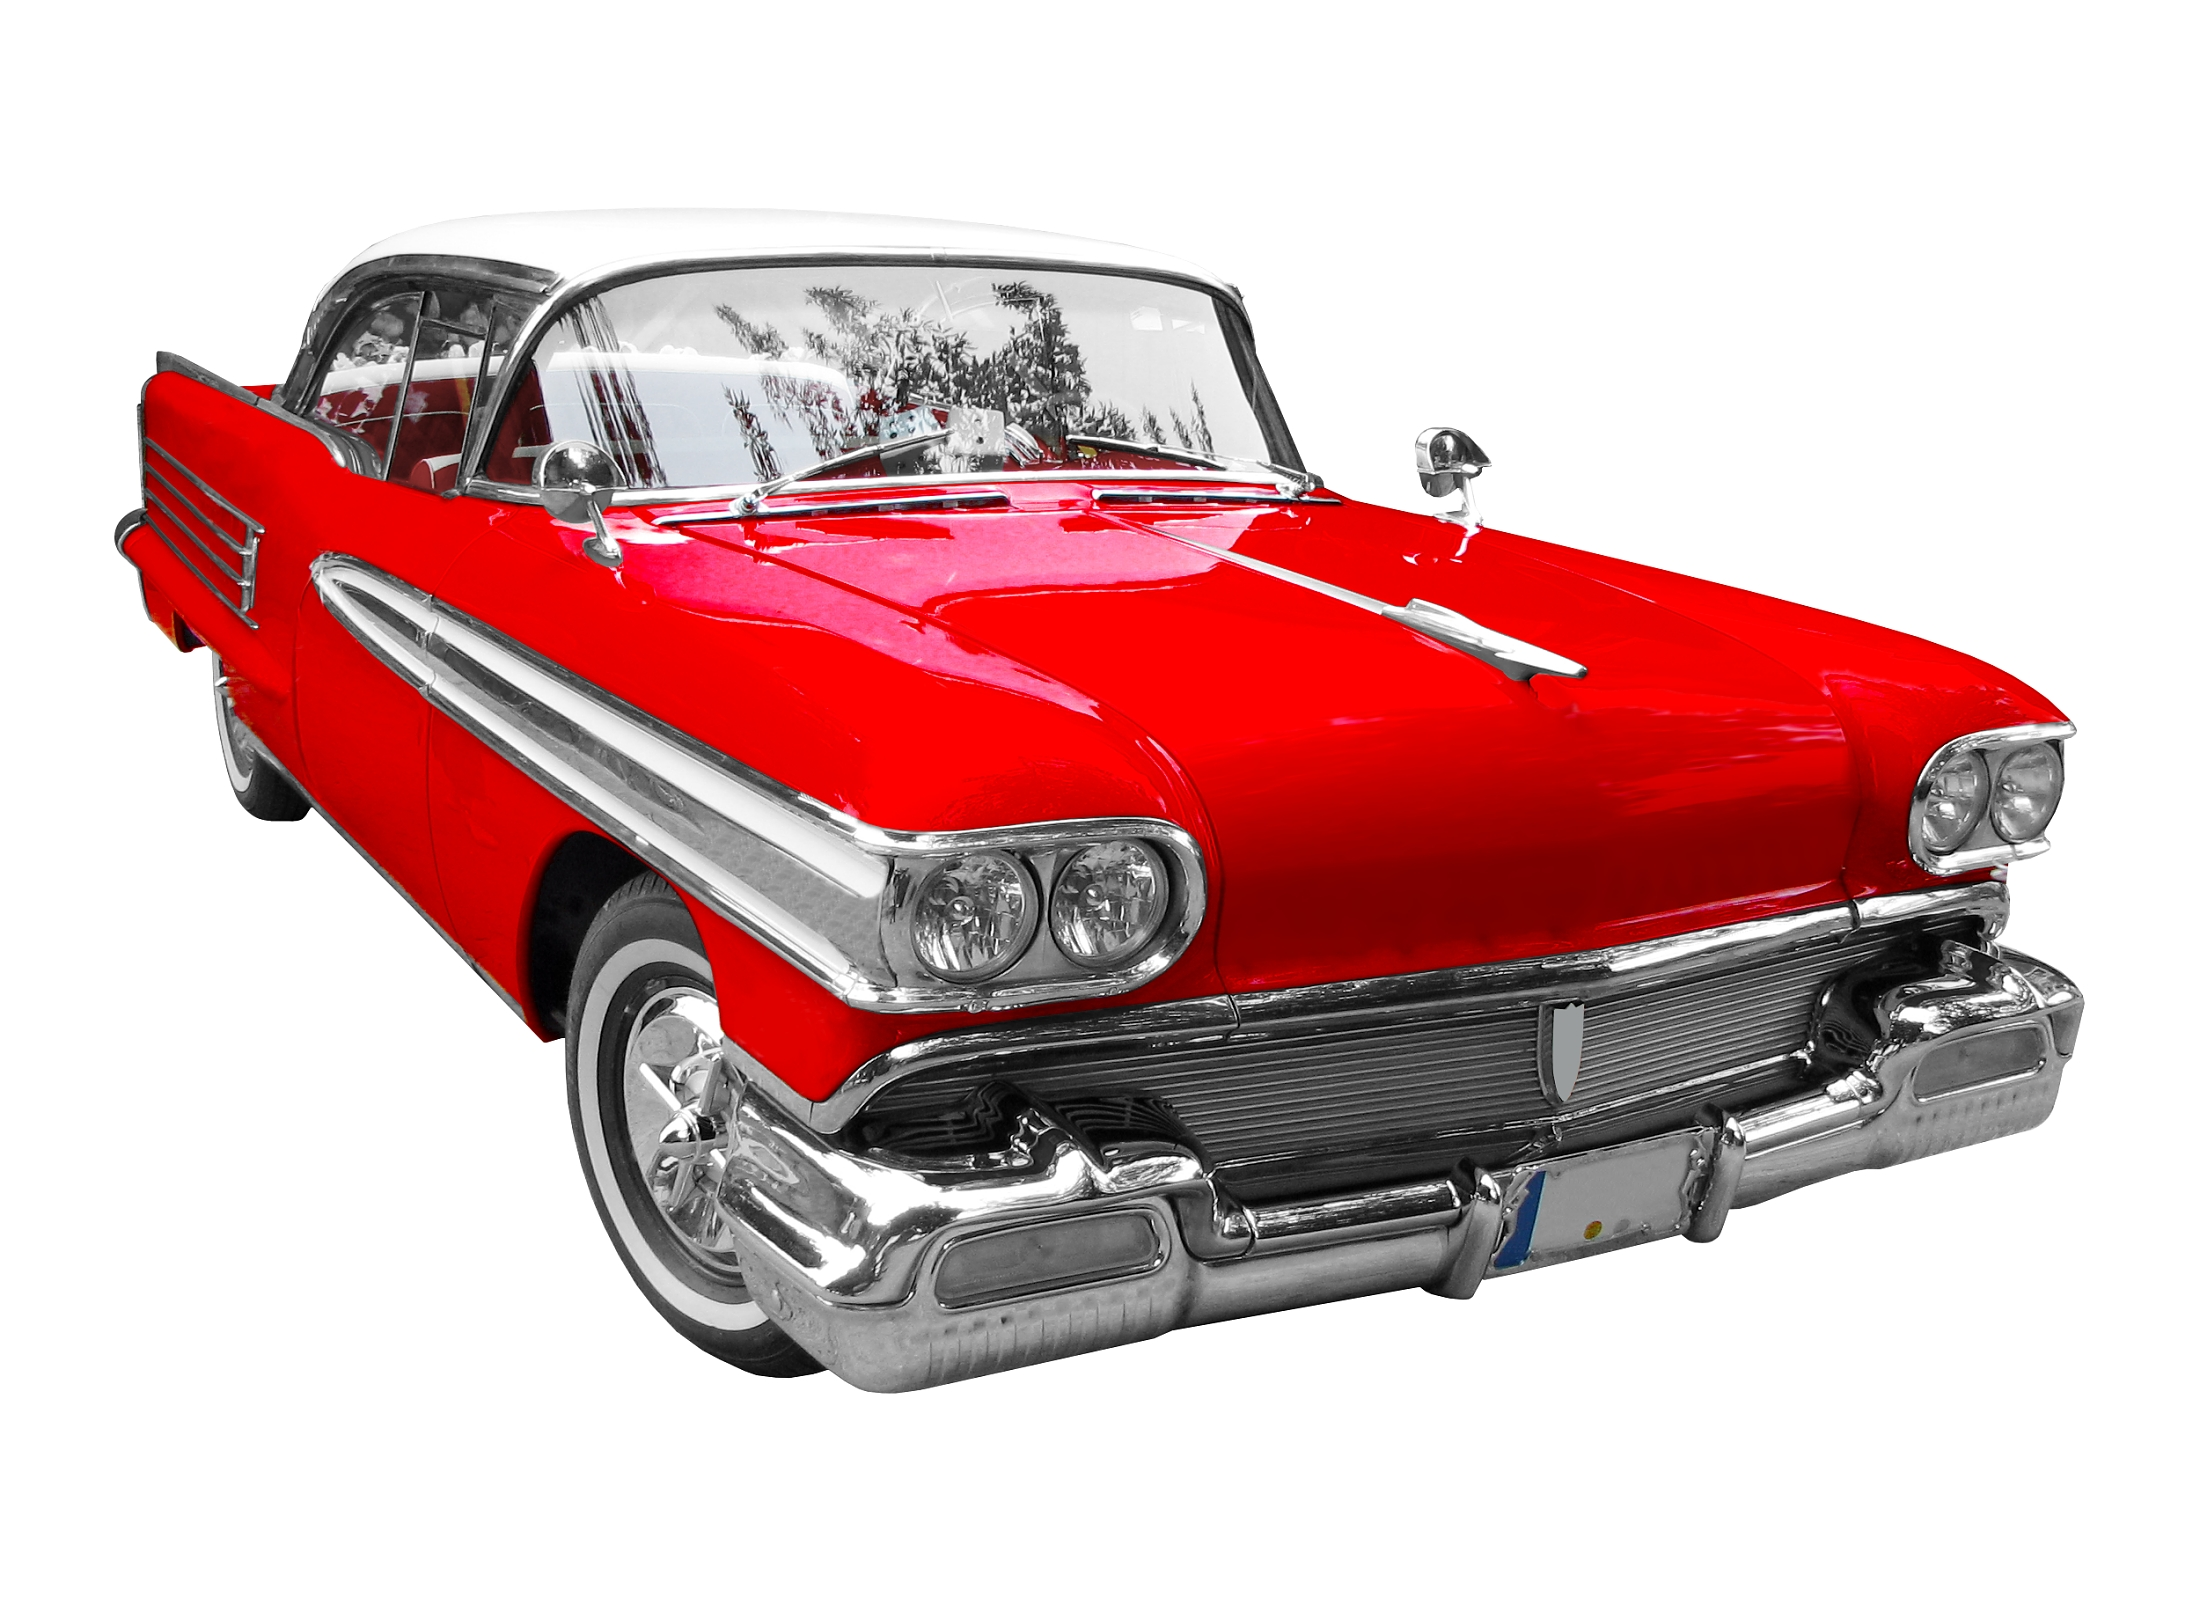 Old Vintage Cars. Interesting Old Classic Cars Antique Vintage ...